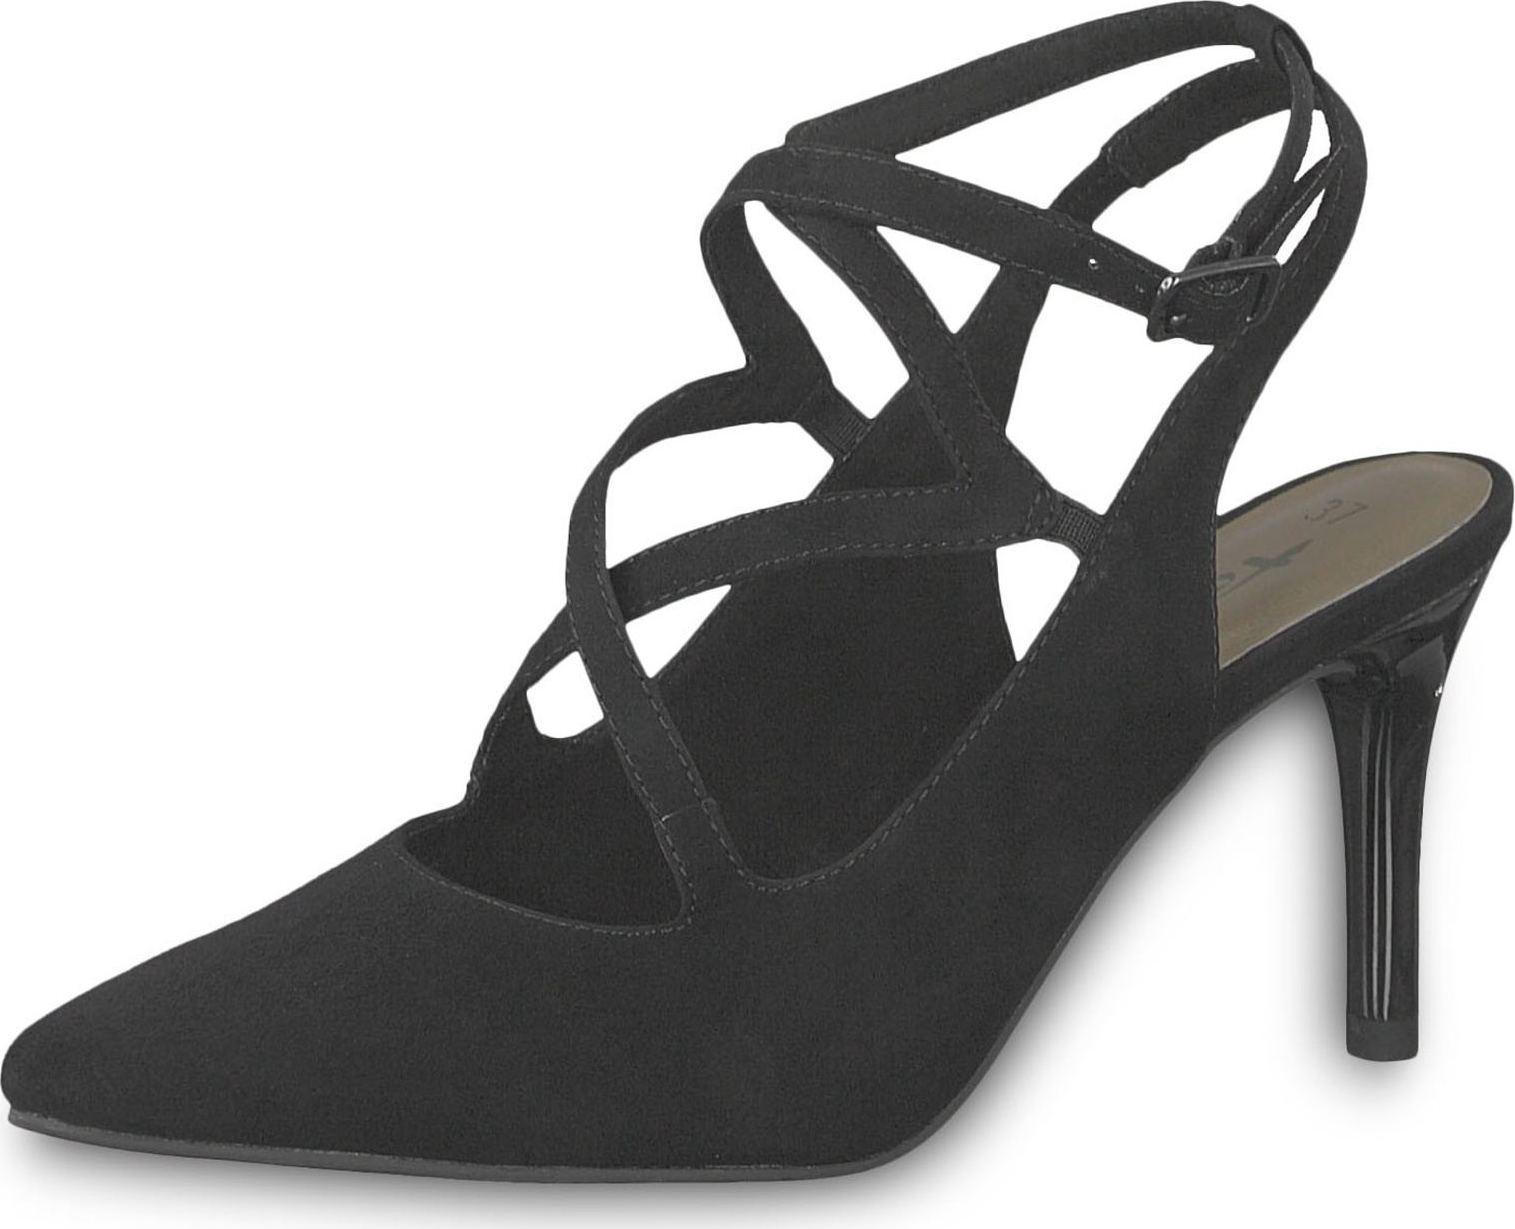 249b1836e4da Dámská obuv TAMARIS 1-1-29605-22 BLACK 001 1-1-29605-22 BLACK 001 ...